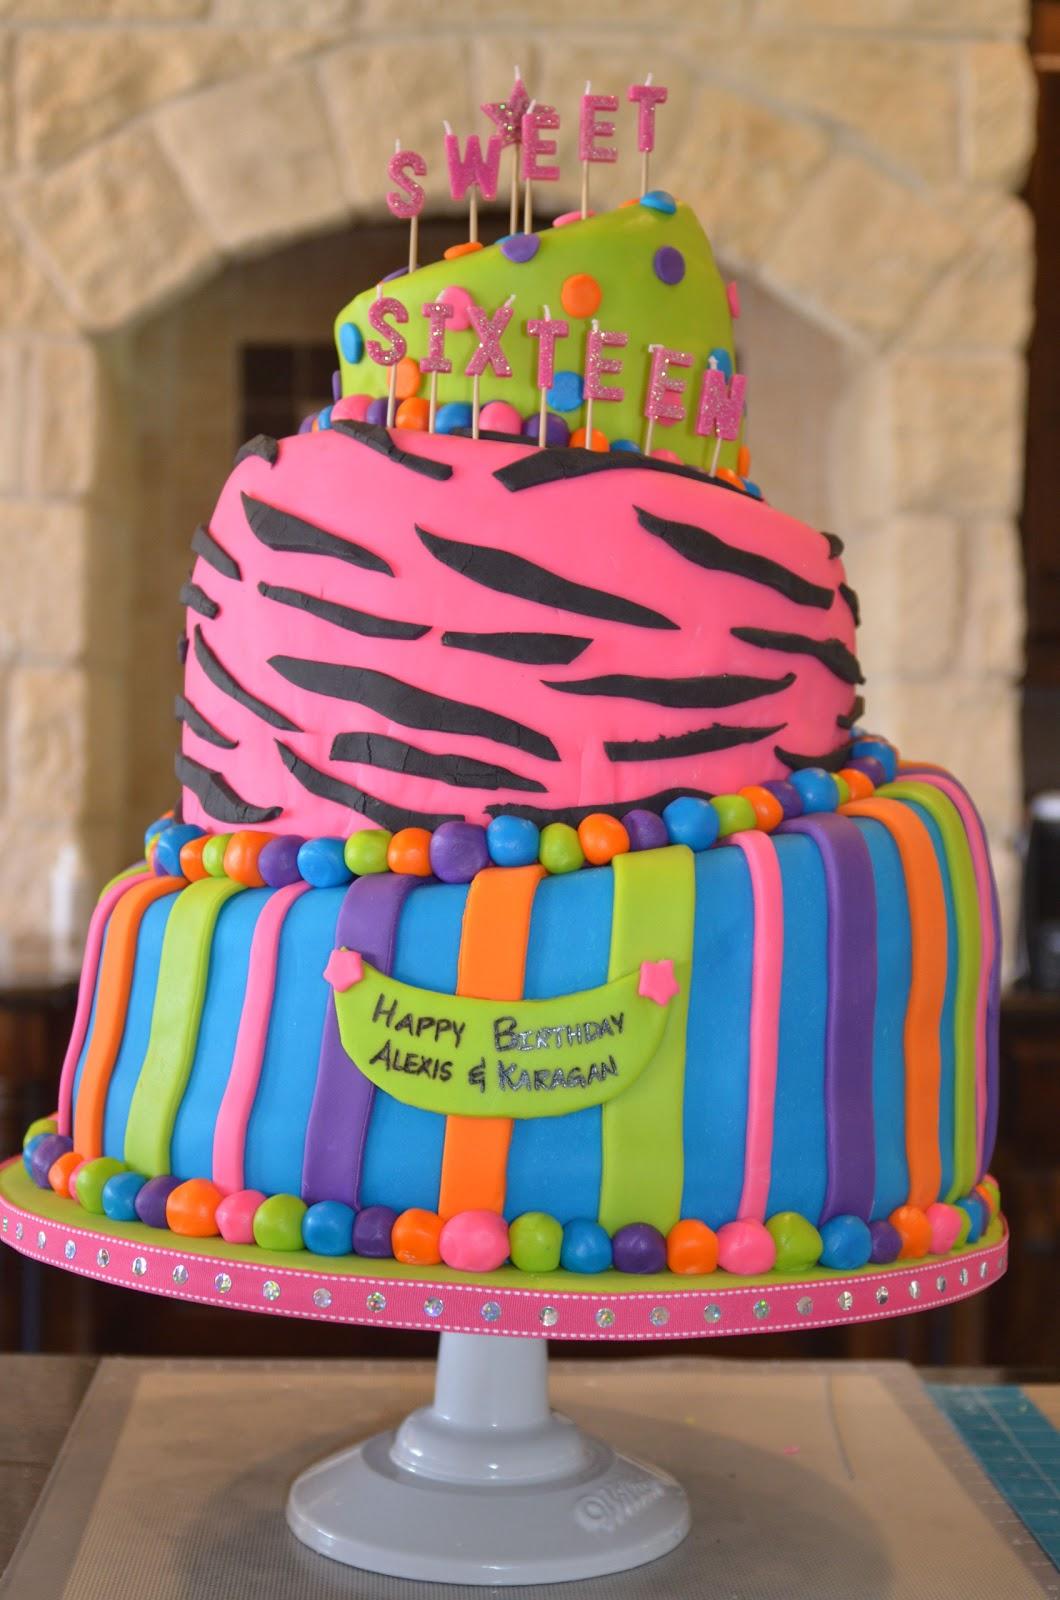 Birthday Cake Images Sweet : Cakes & Canines: Sweet 16 Birthday Cake